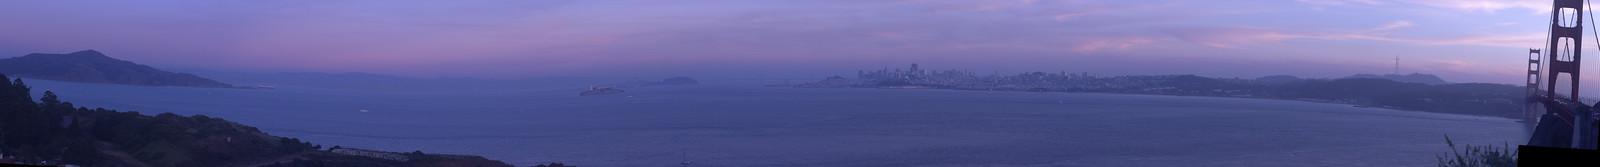 San Francisco panoramas